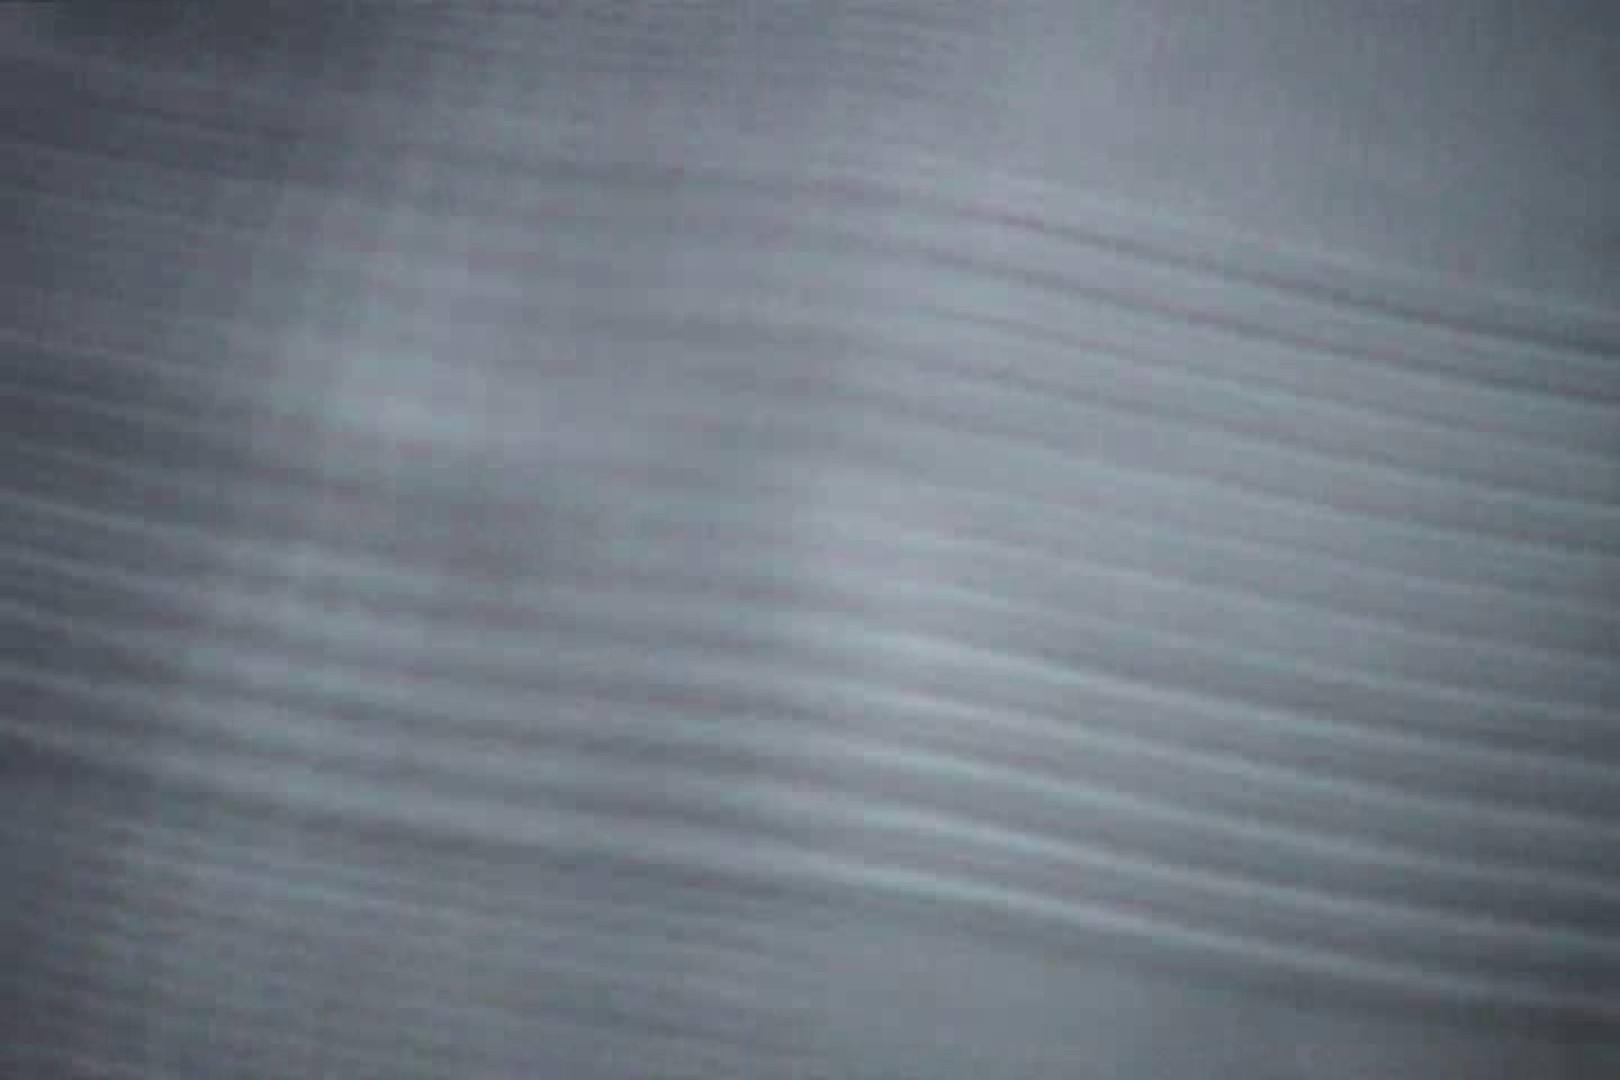 パンチラ局部接写!低空飛行Vol.13 OLヌード天国 盗撮動画紹介 110PIX 94